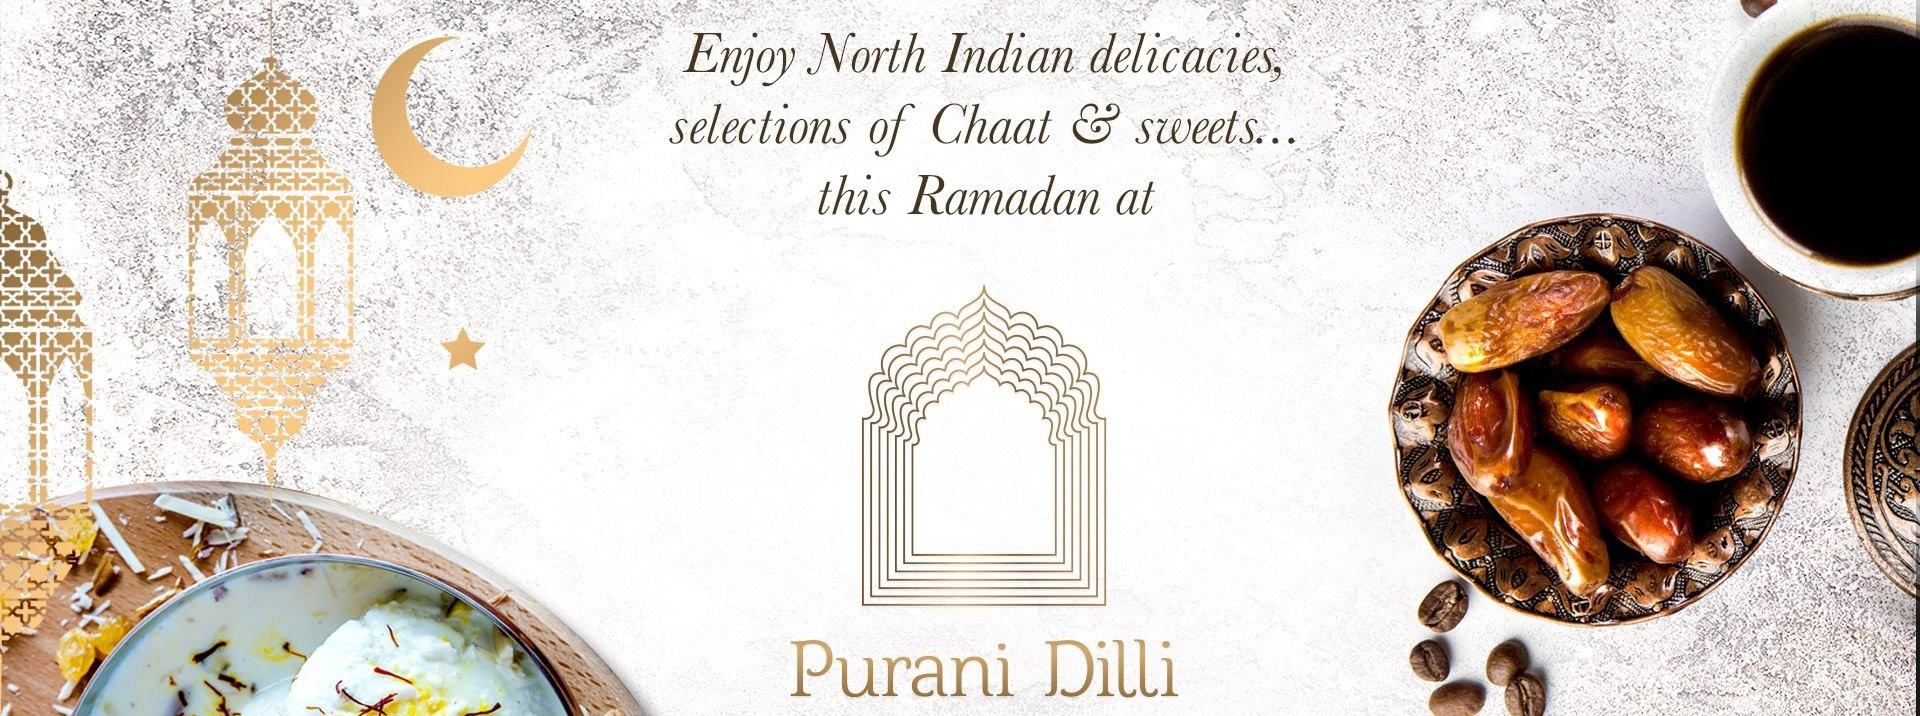 Iftar at Purani Dilli - Coming Soon in UAE